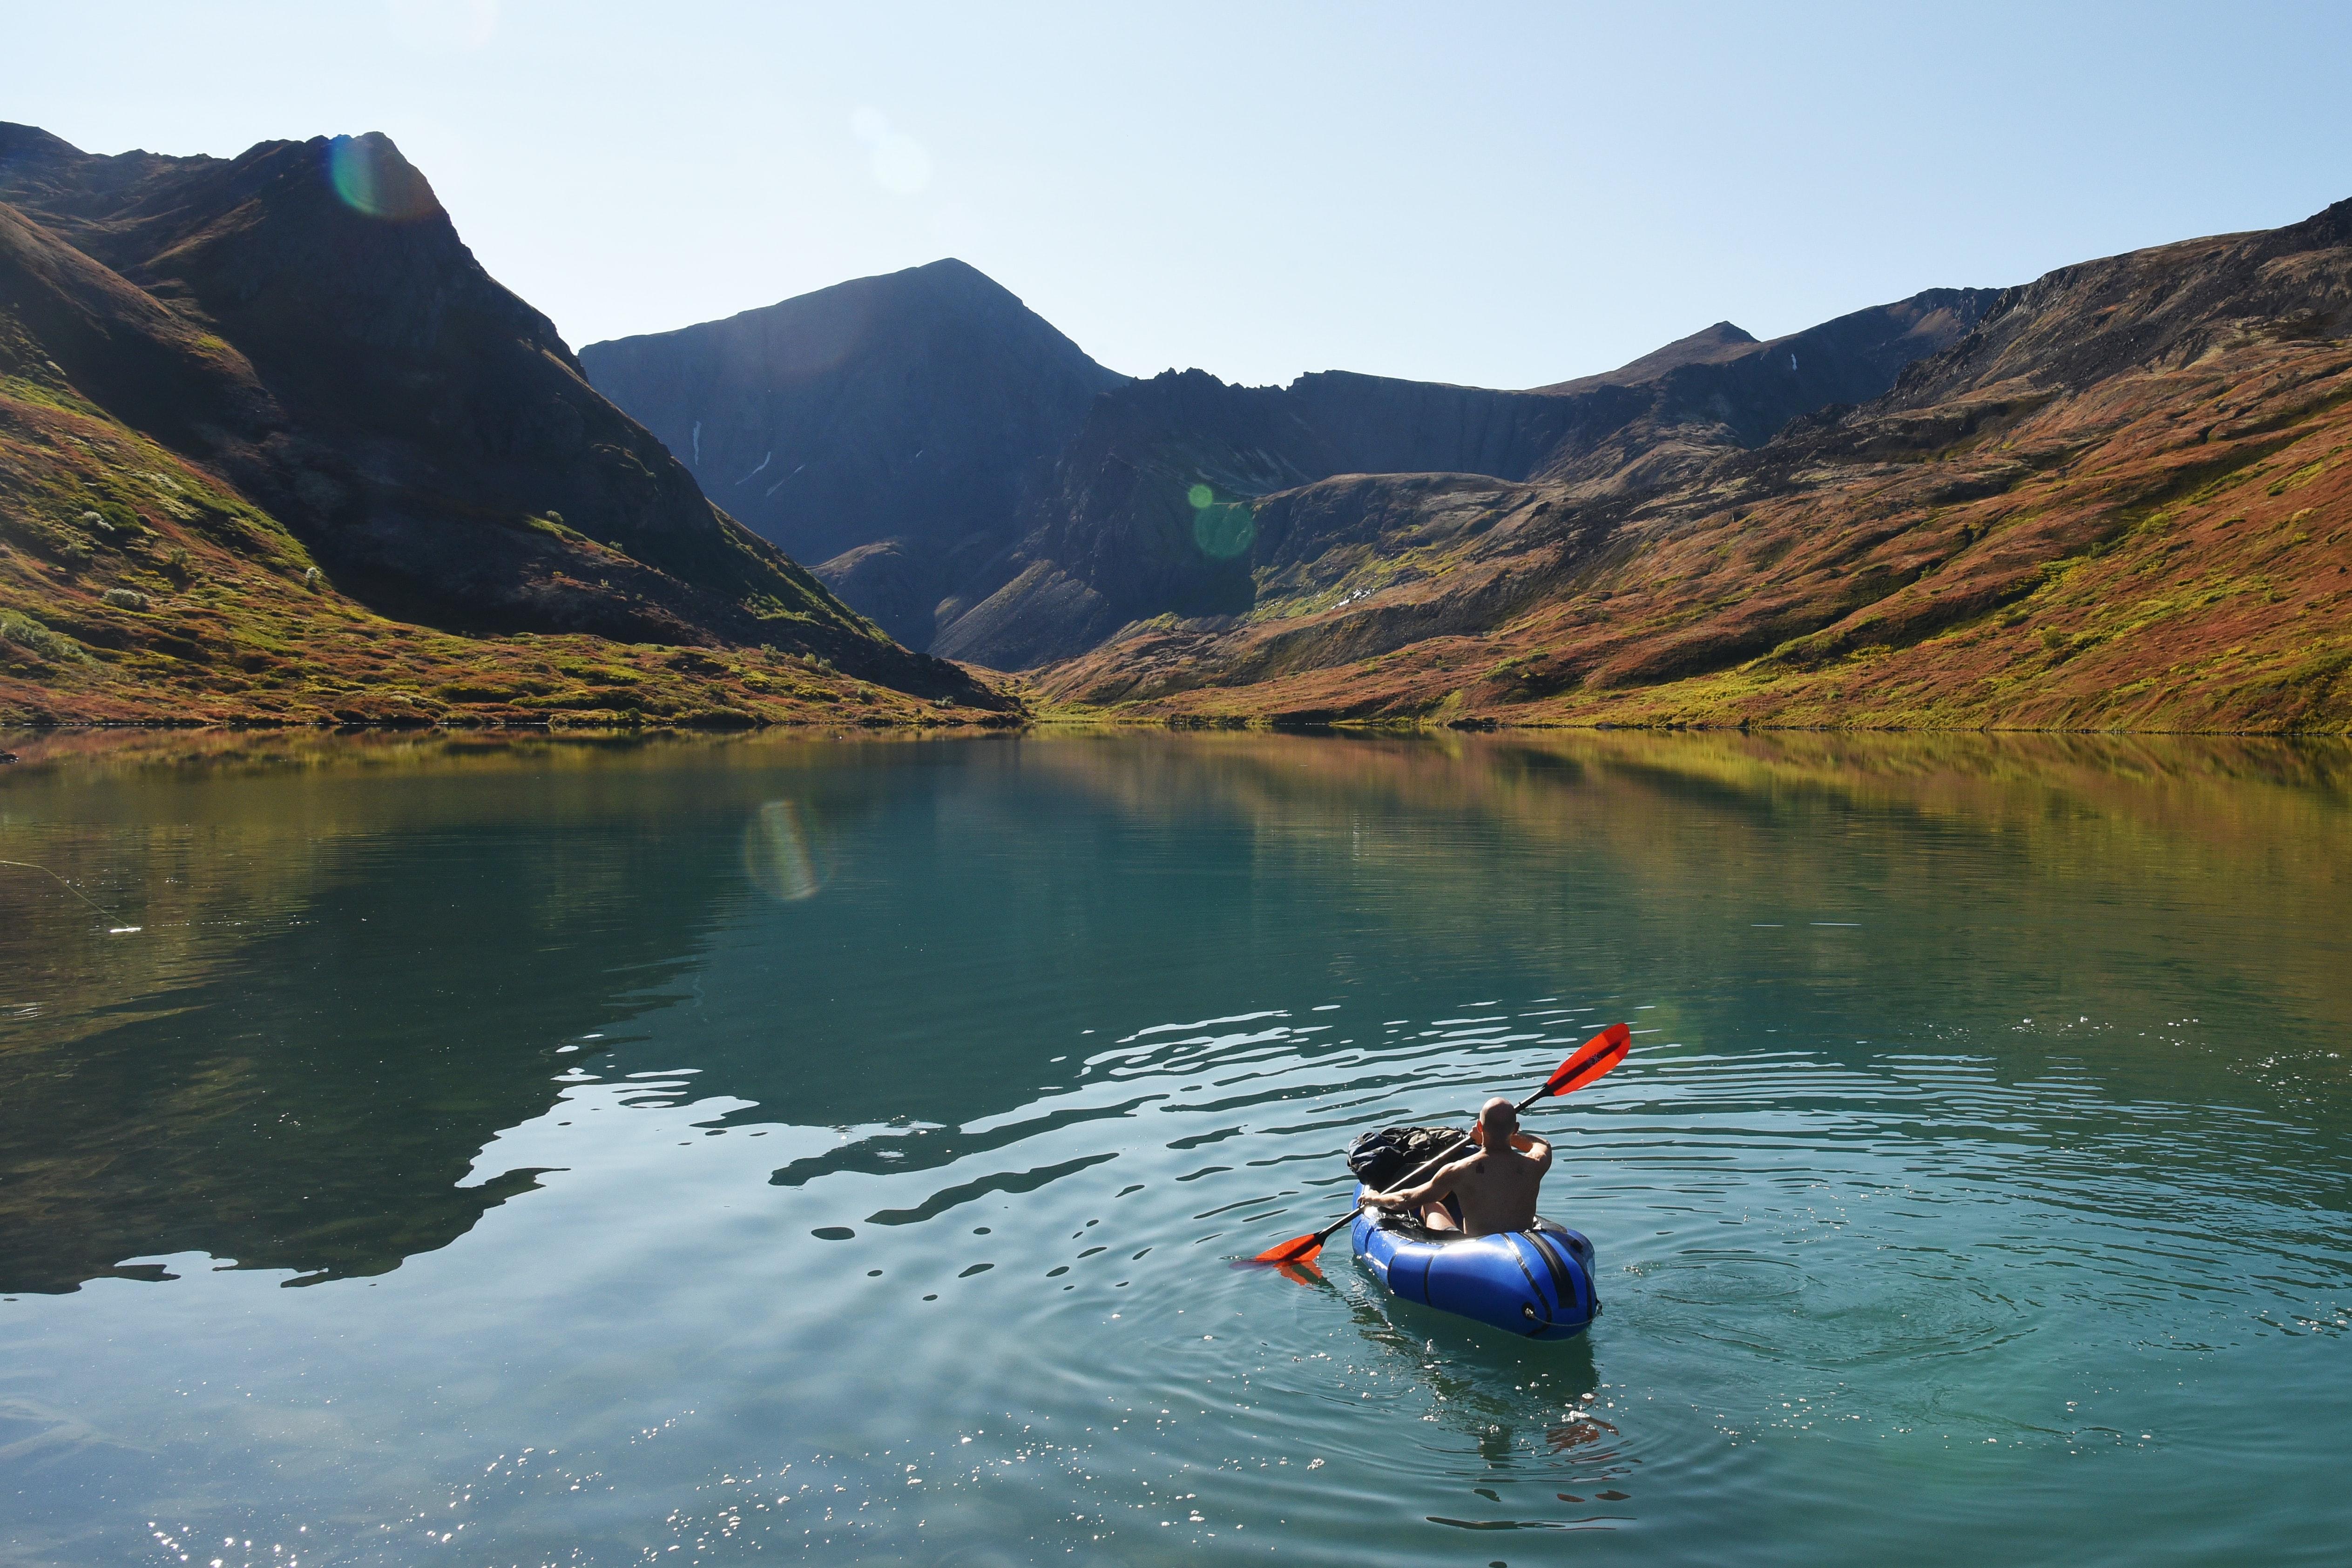 kayaker paddling on a lake in chugach state park in alaska